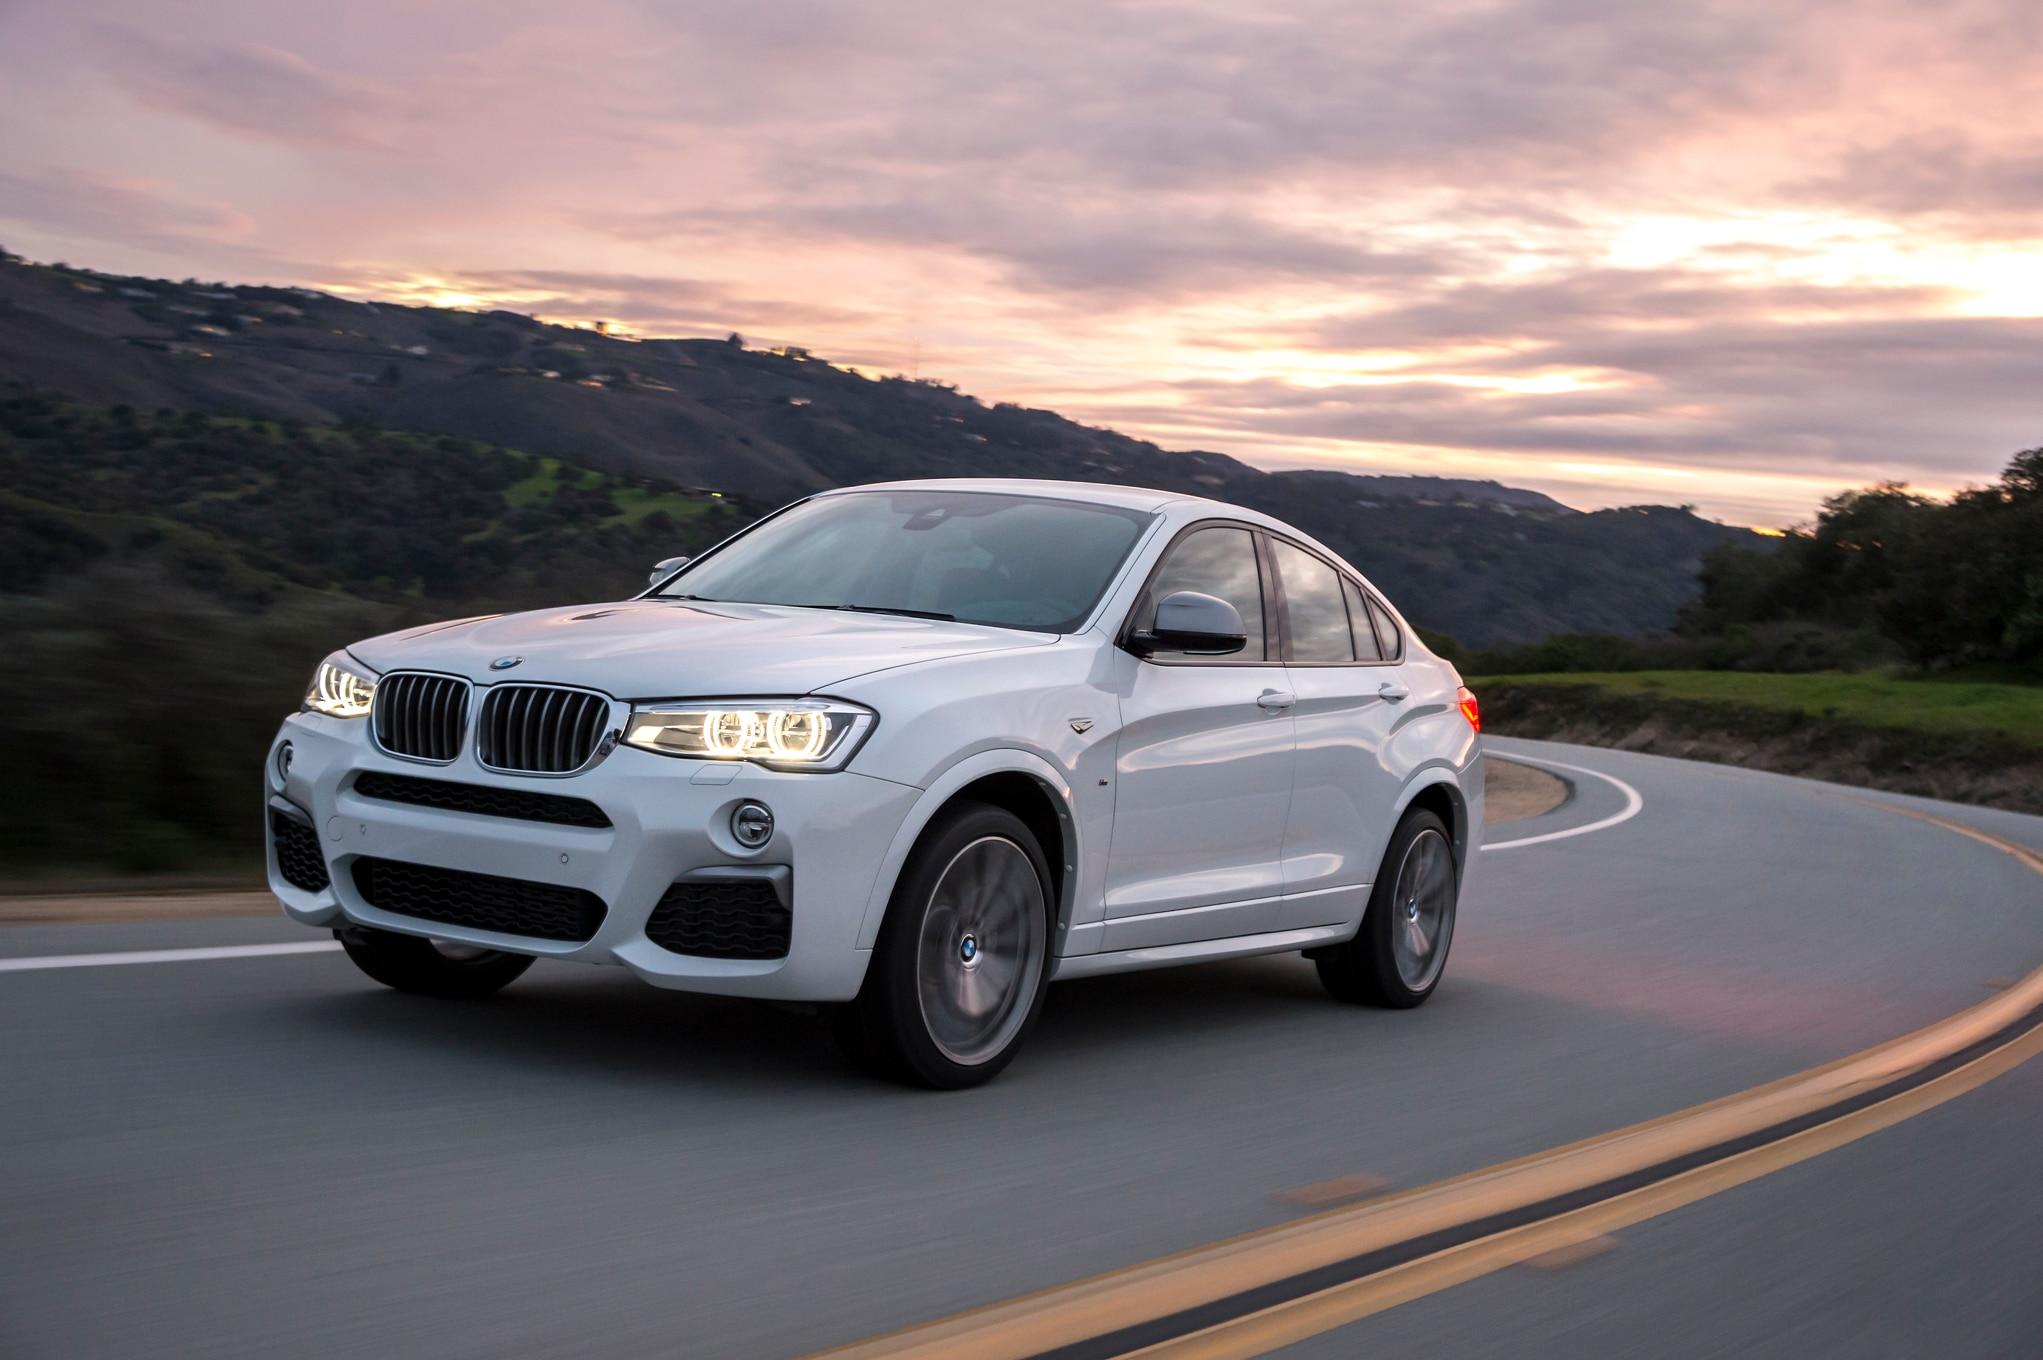 2016 BMW X4 M40i Front Three Quarter In Motion 13 1